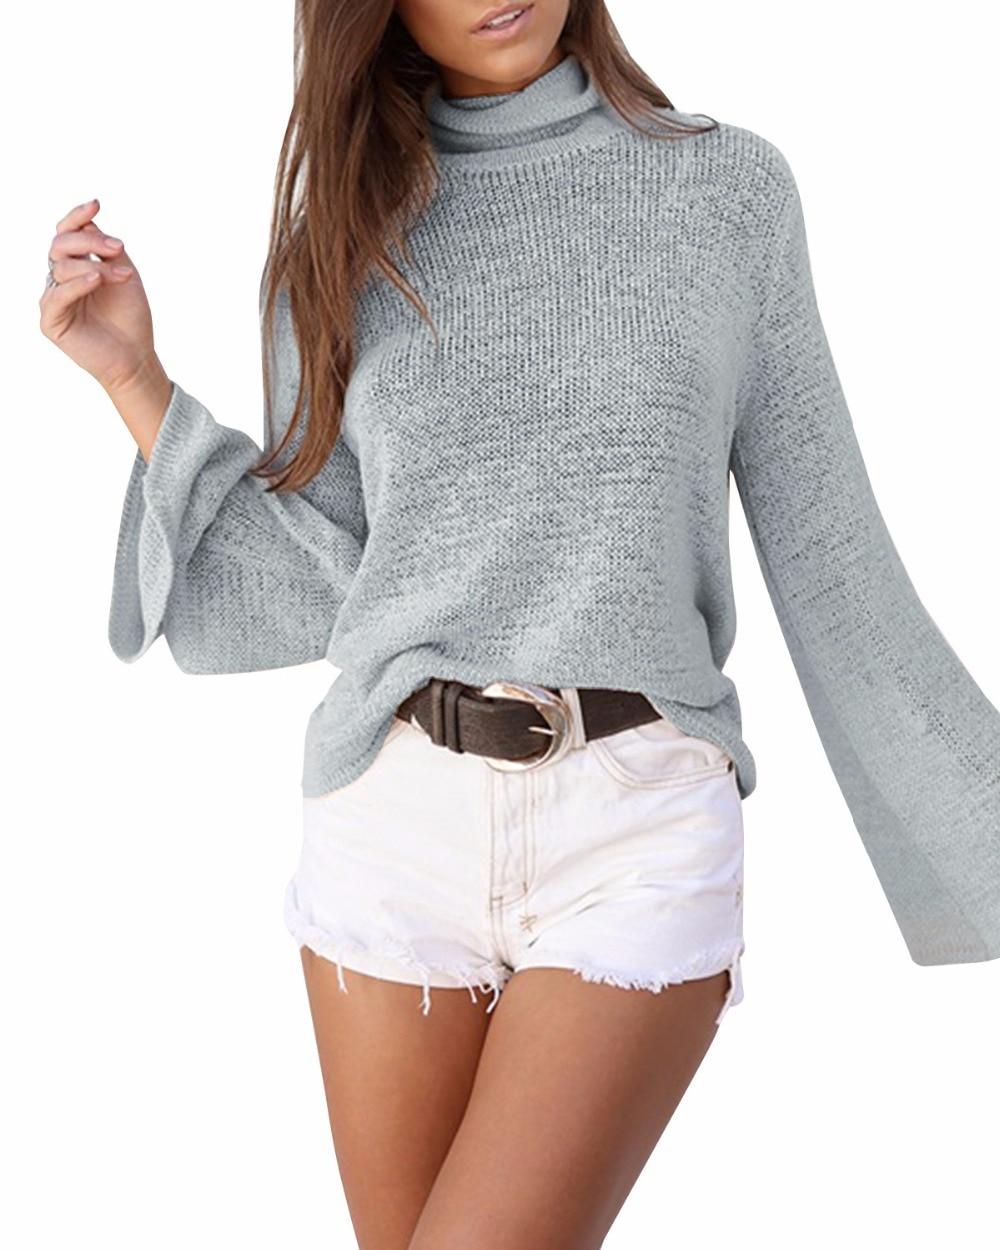 10 pcs/lots Spot Back Straps Long sleeves bat sweater coat